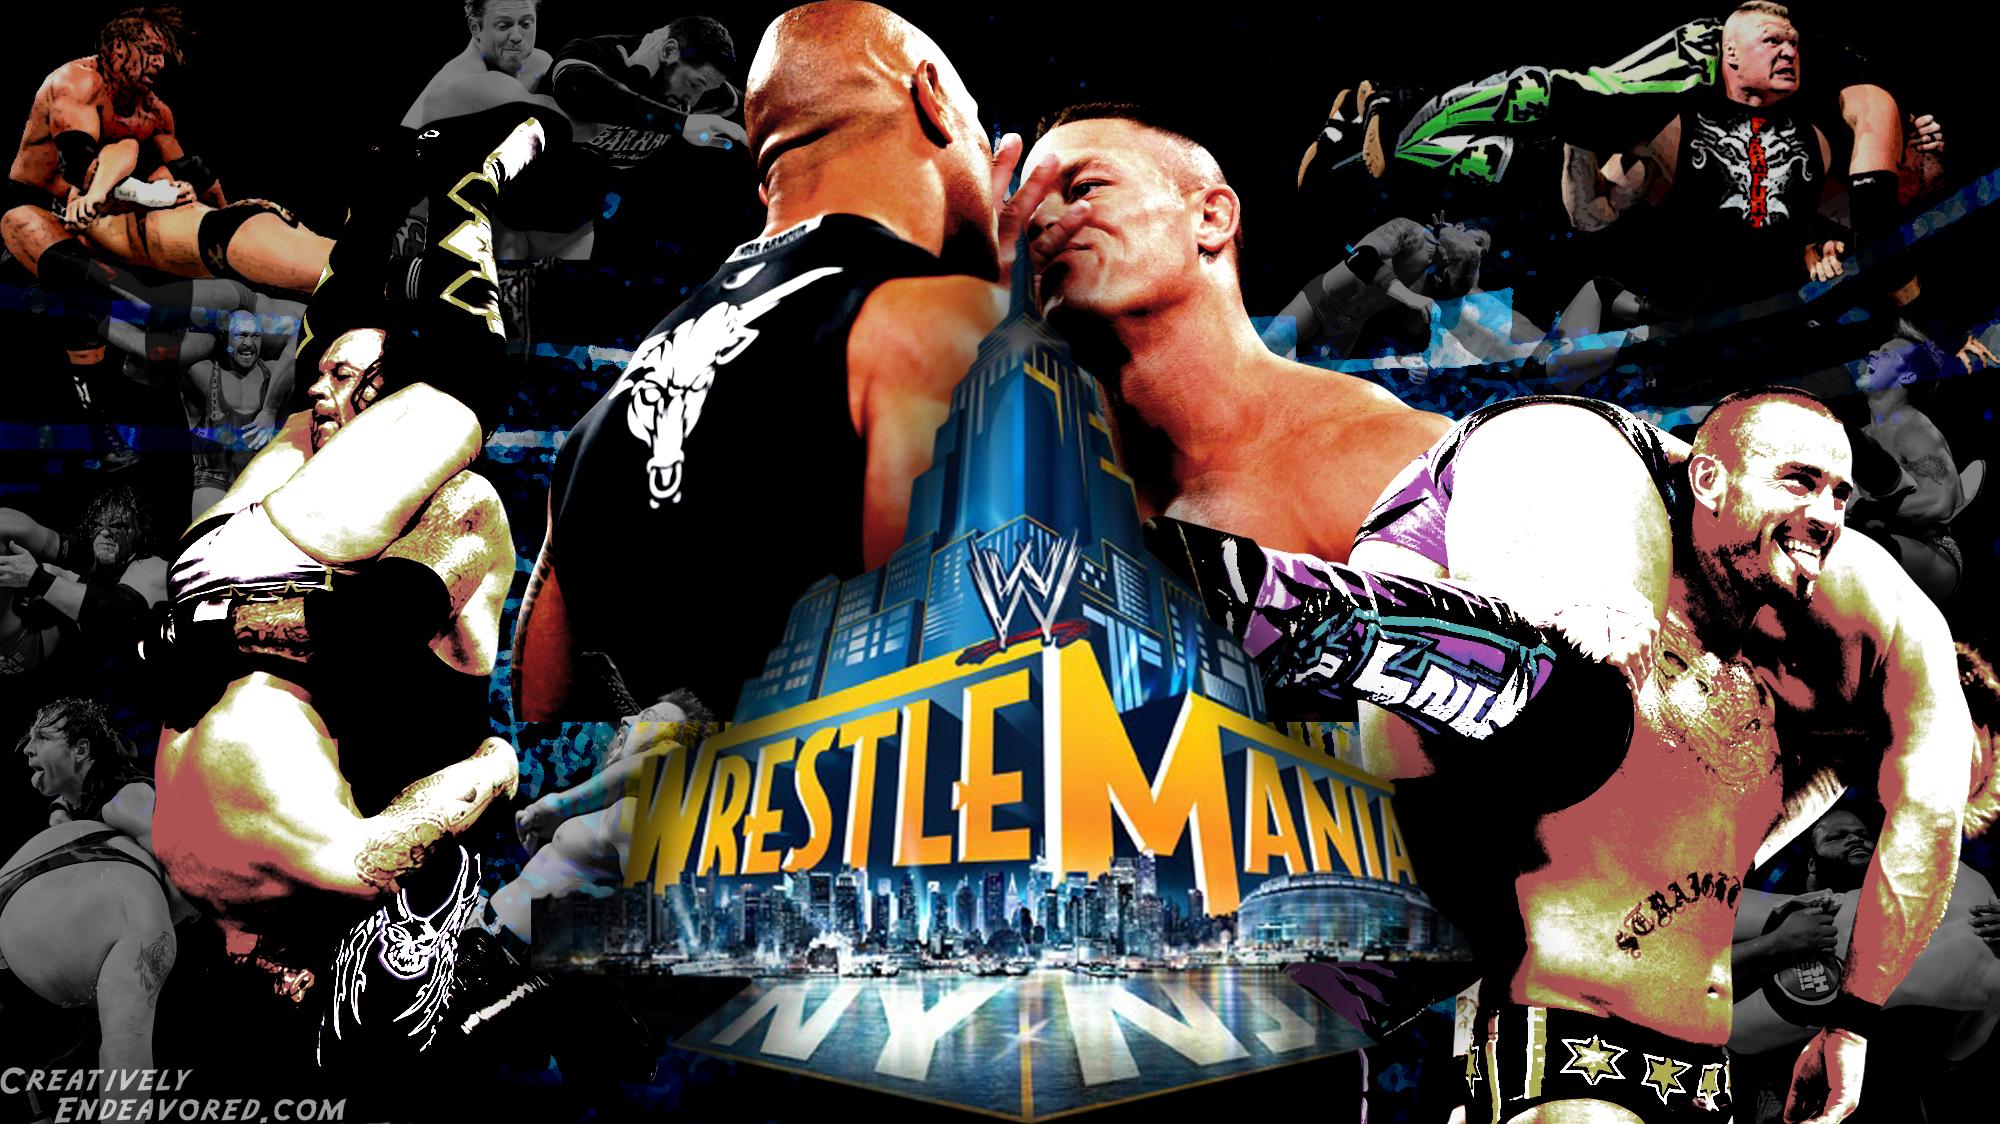 The Stars Of WrestleMania 29